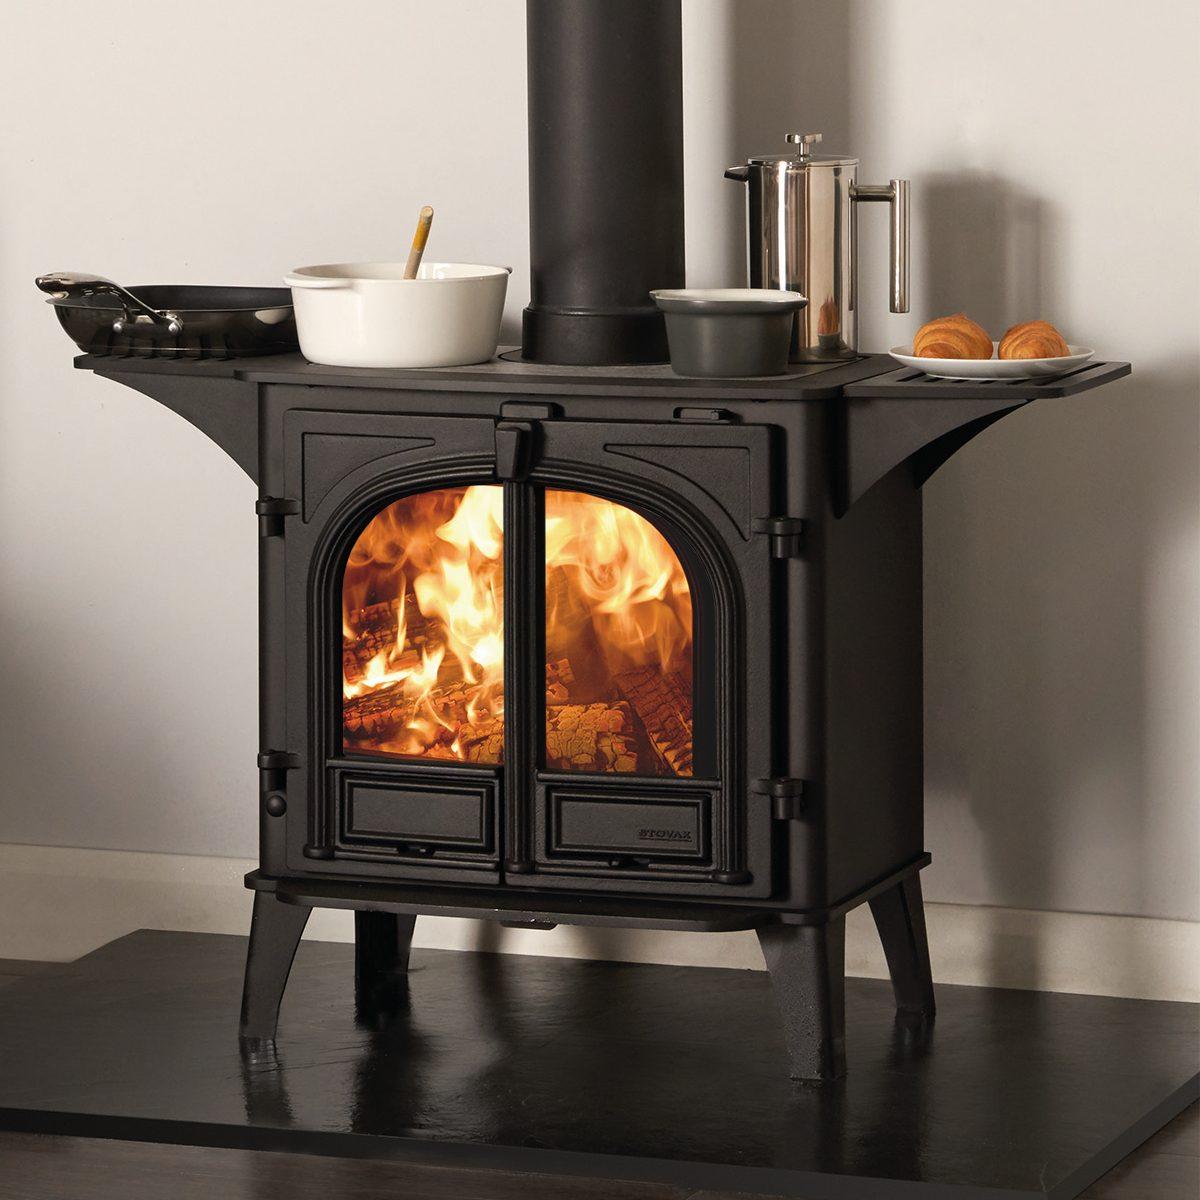 Stovax Stockton 8 Double Door Wood Burning Cook Stove